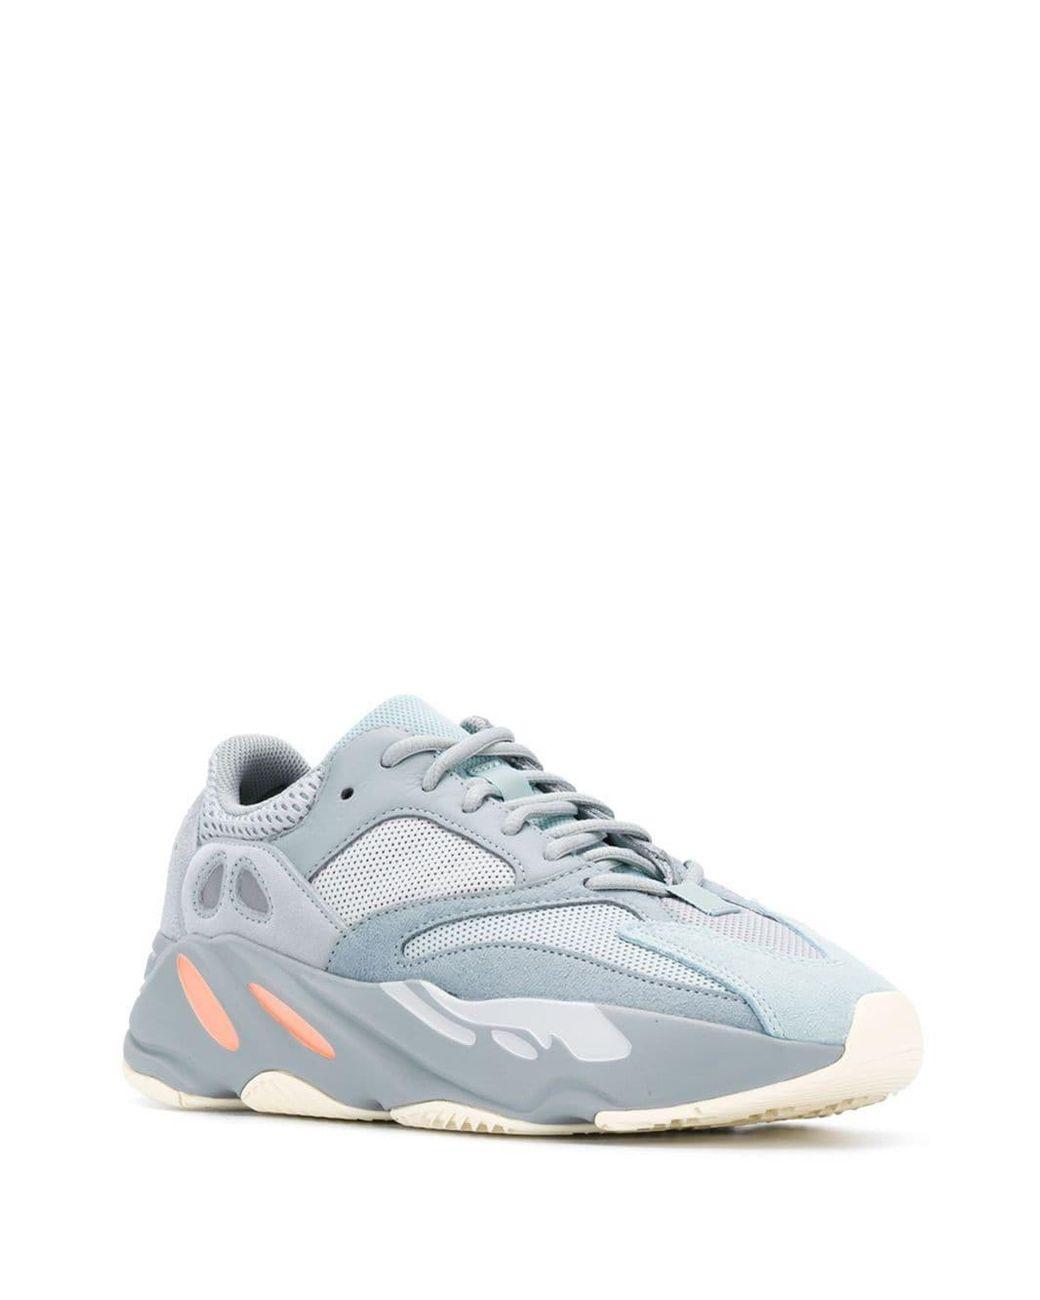 size 40 a2fd3 2a808 Women's Blue Adidas X Yeezy Boost 700 Inertia Sneakers